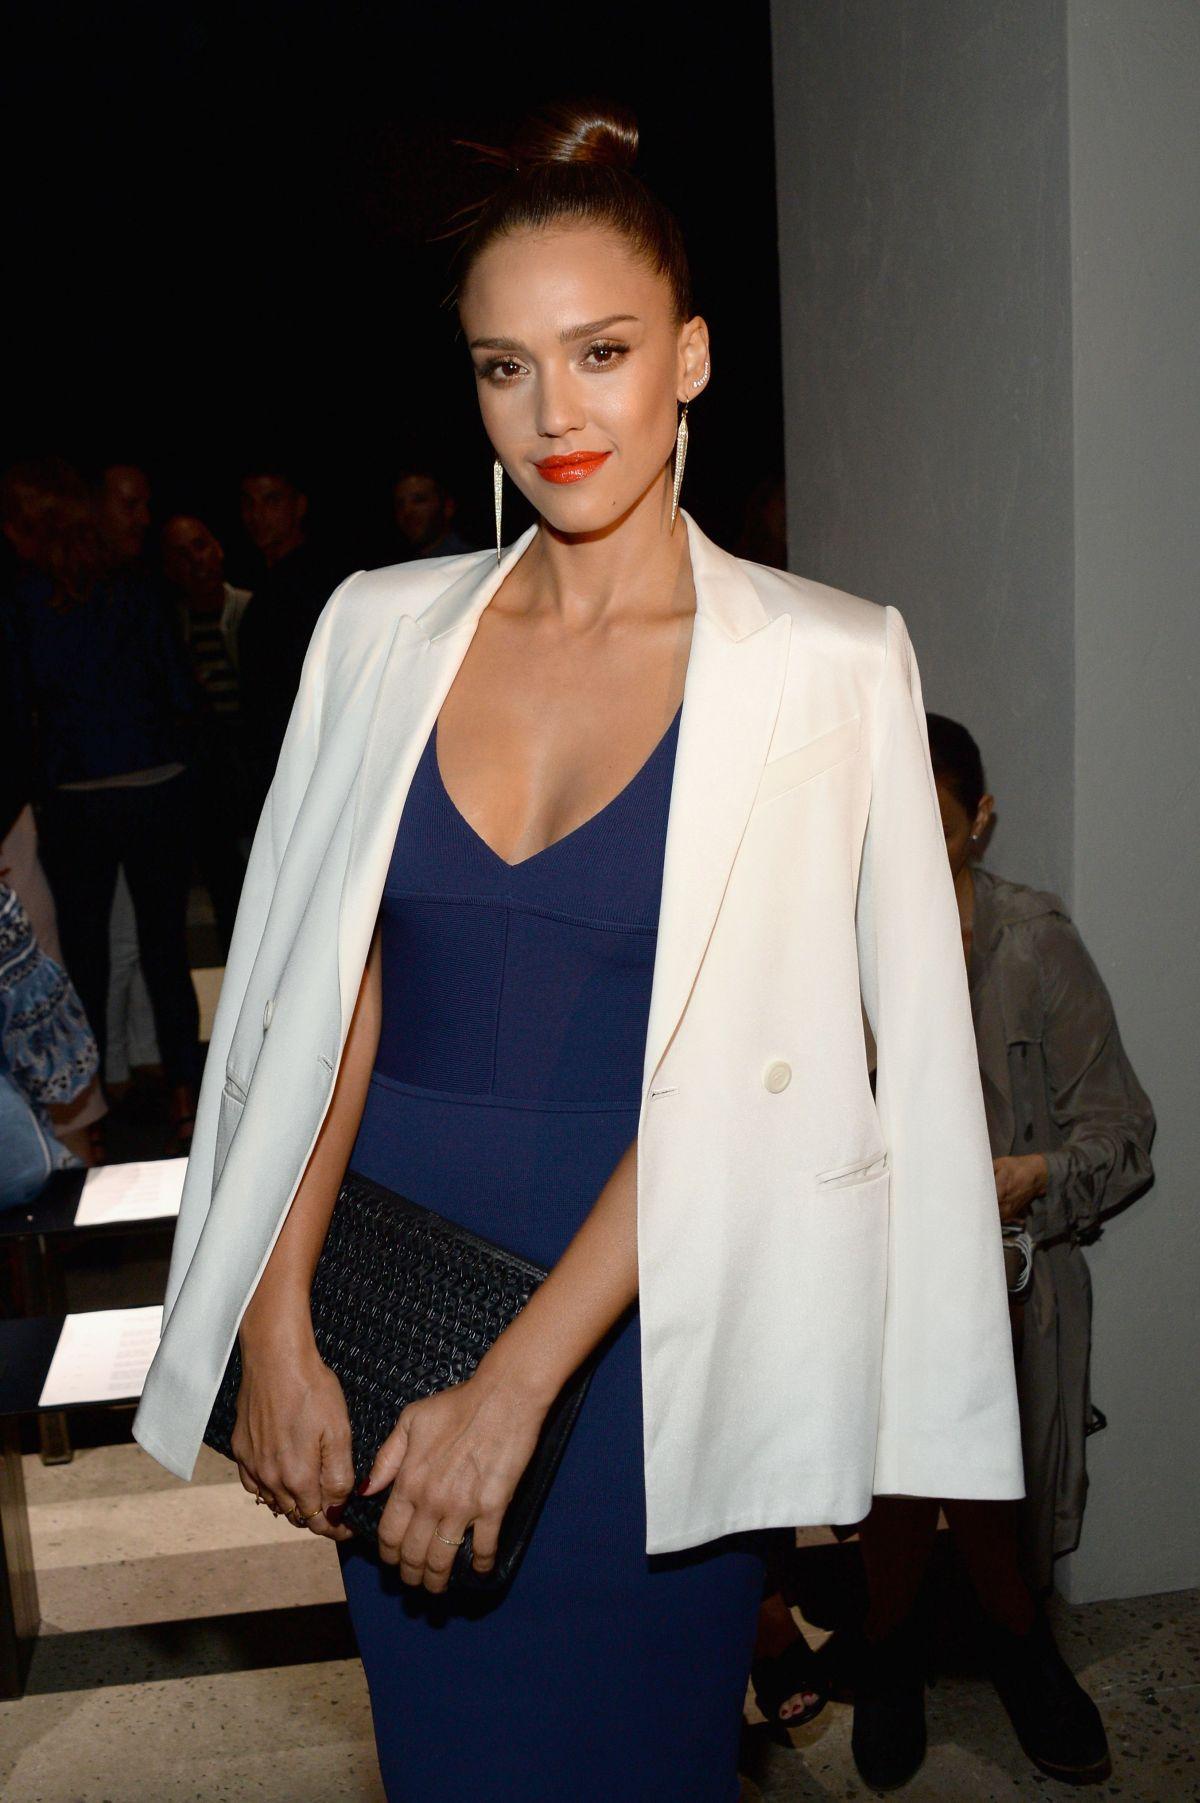 Jessica alba fashion show 50